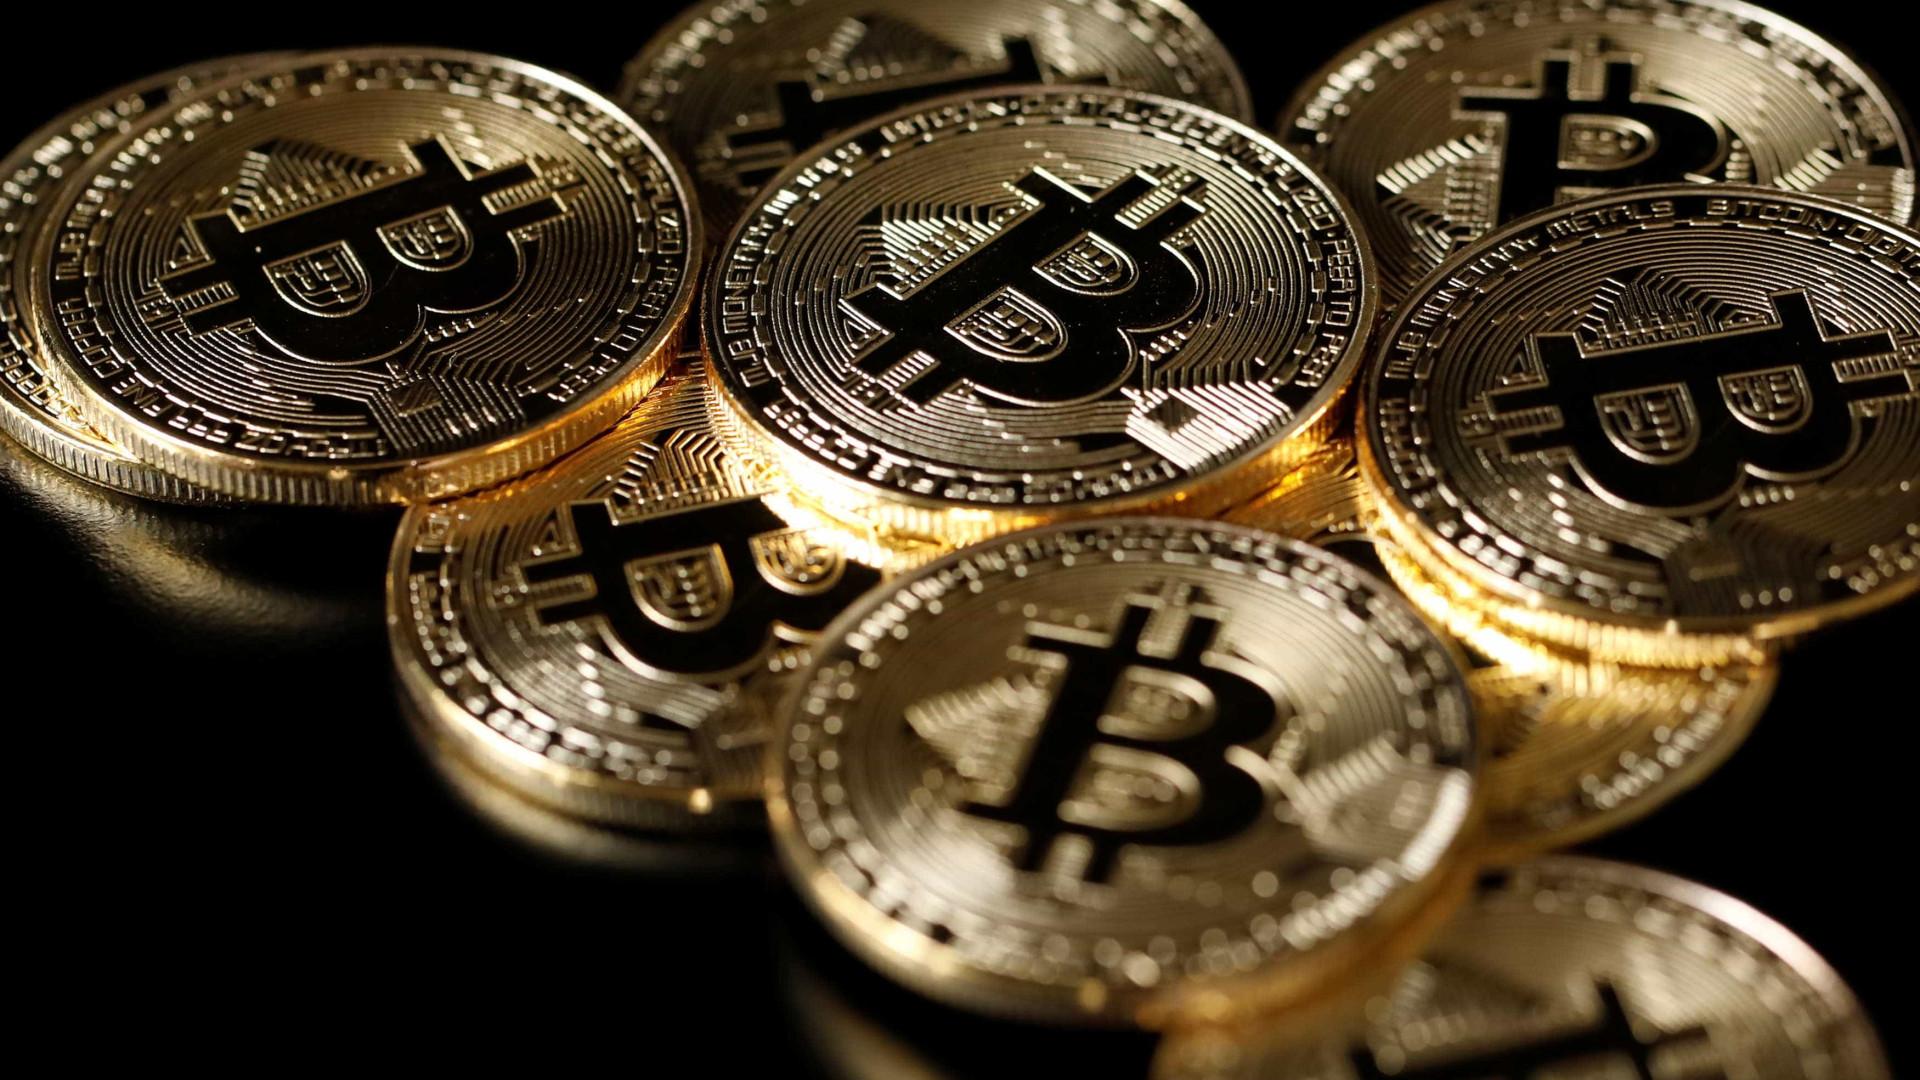 Suíça rejeita projeto de 'moeda soberana' no país